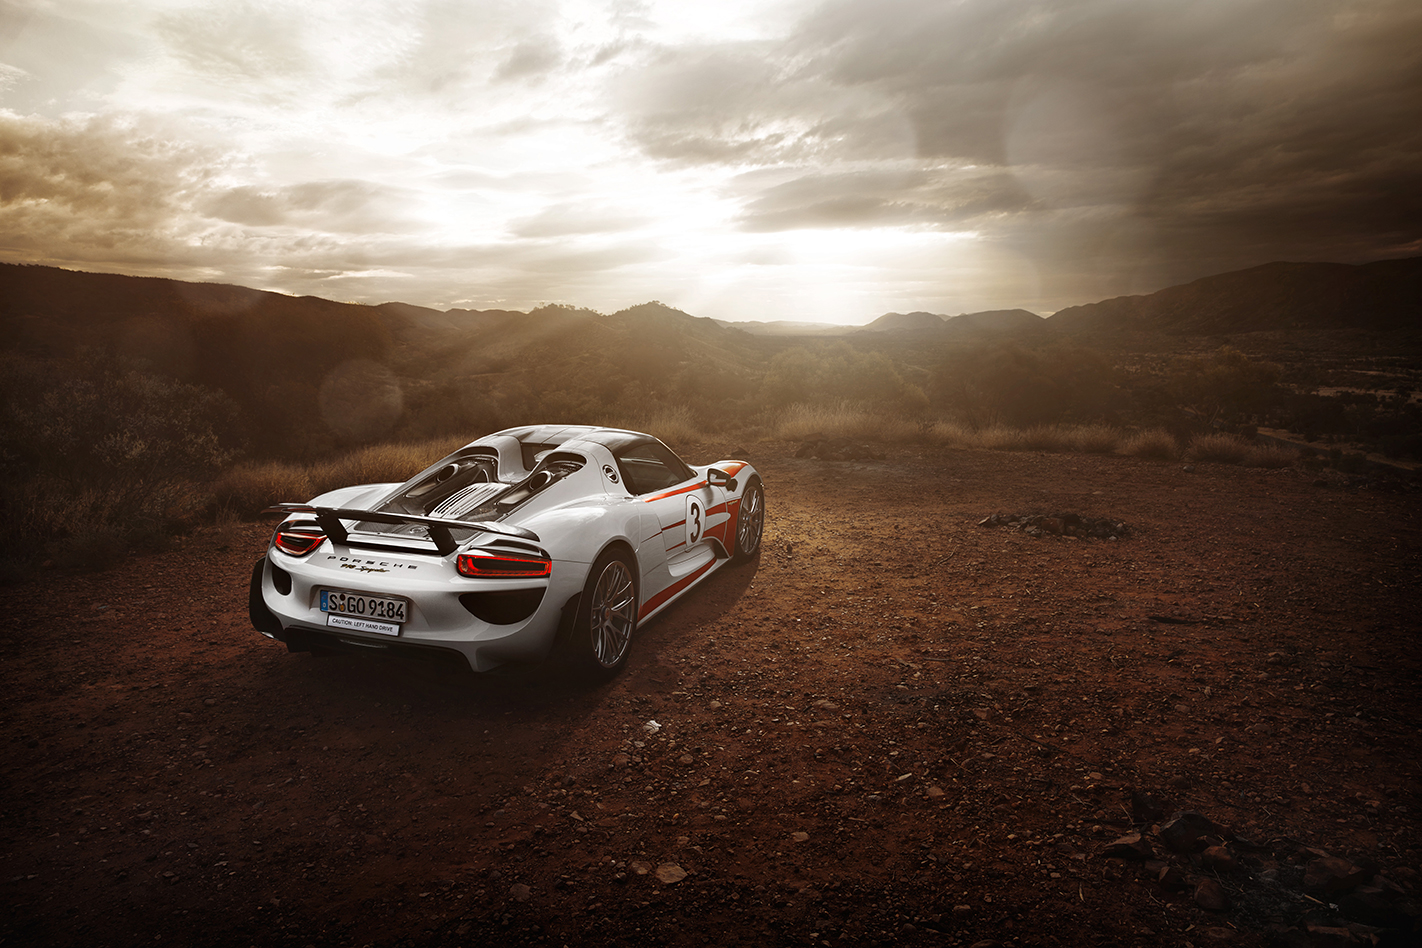 Porsche 918 in the outback